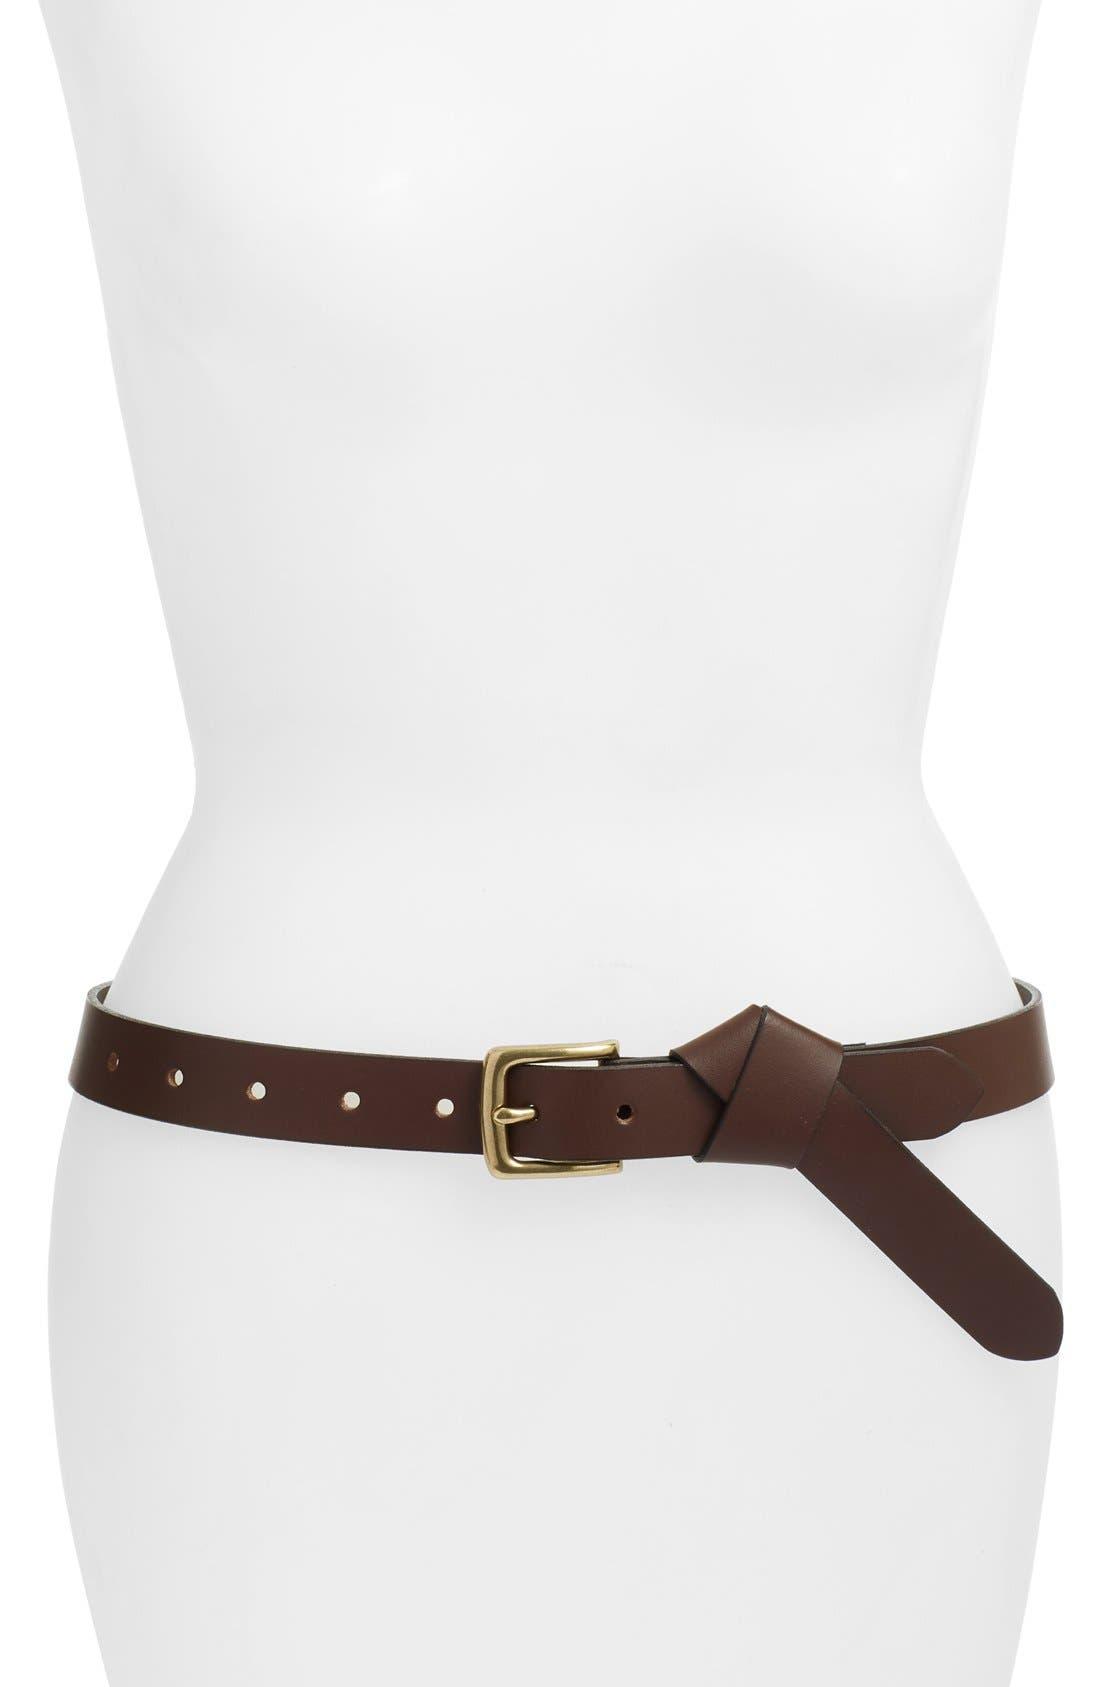 Alternate Image 1 Selected - Treasure&Bond Knotted Leather Belt